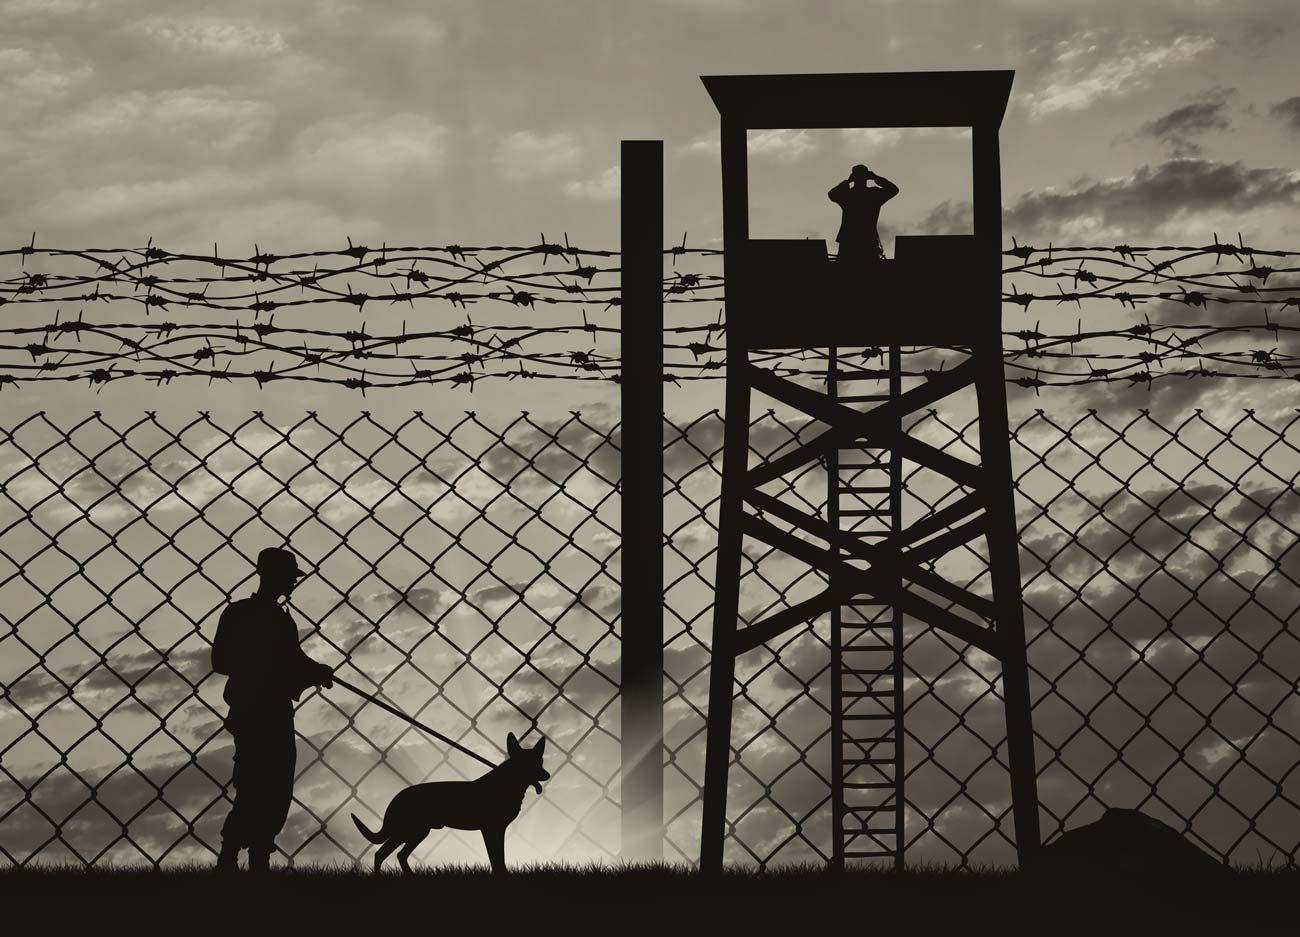 Охрана периметра тюрьмы